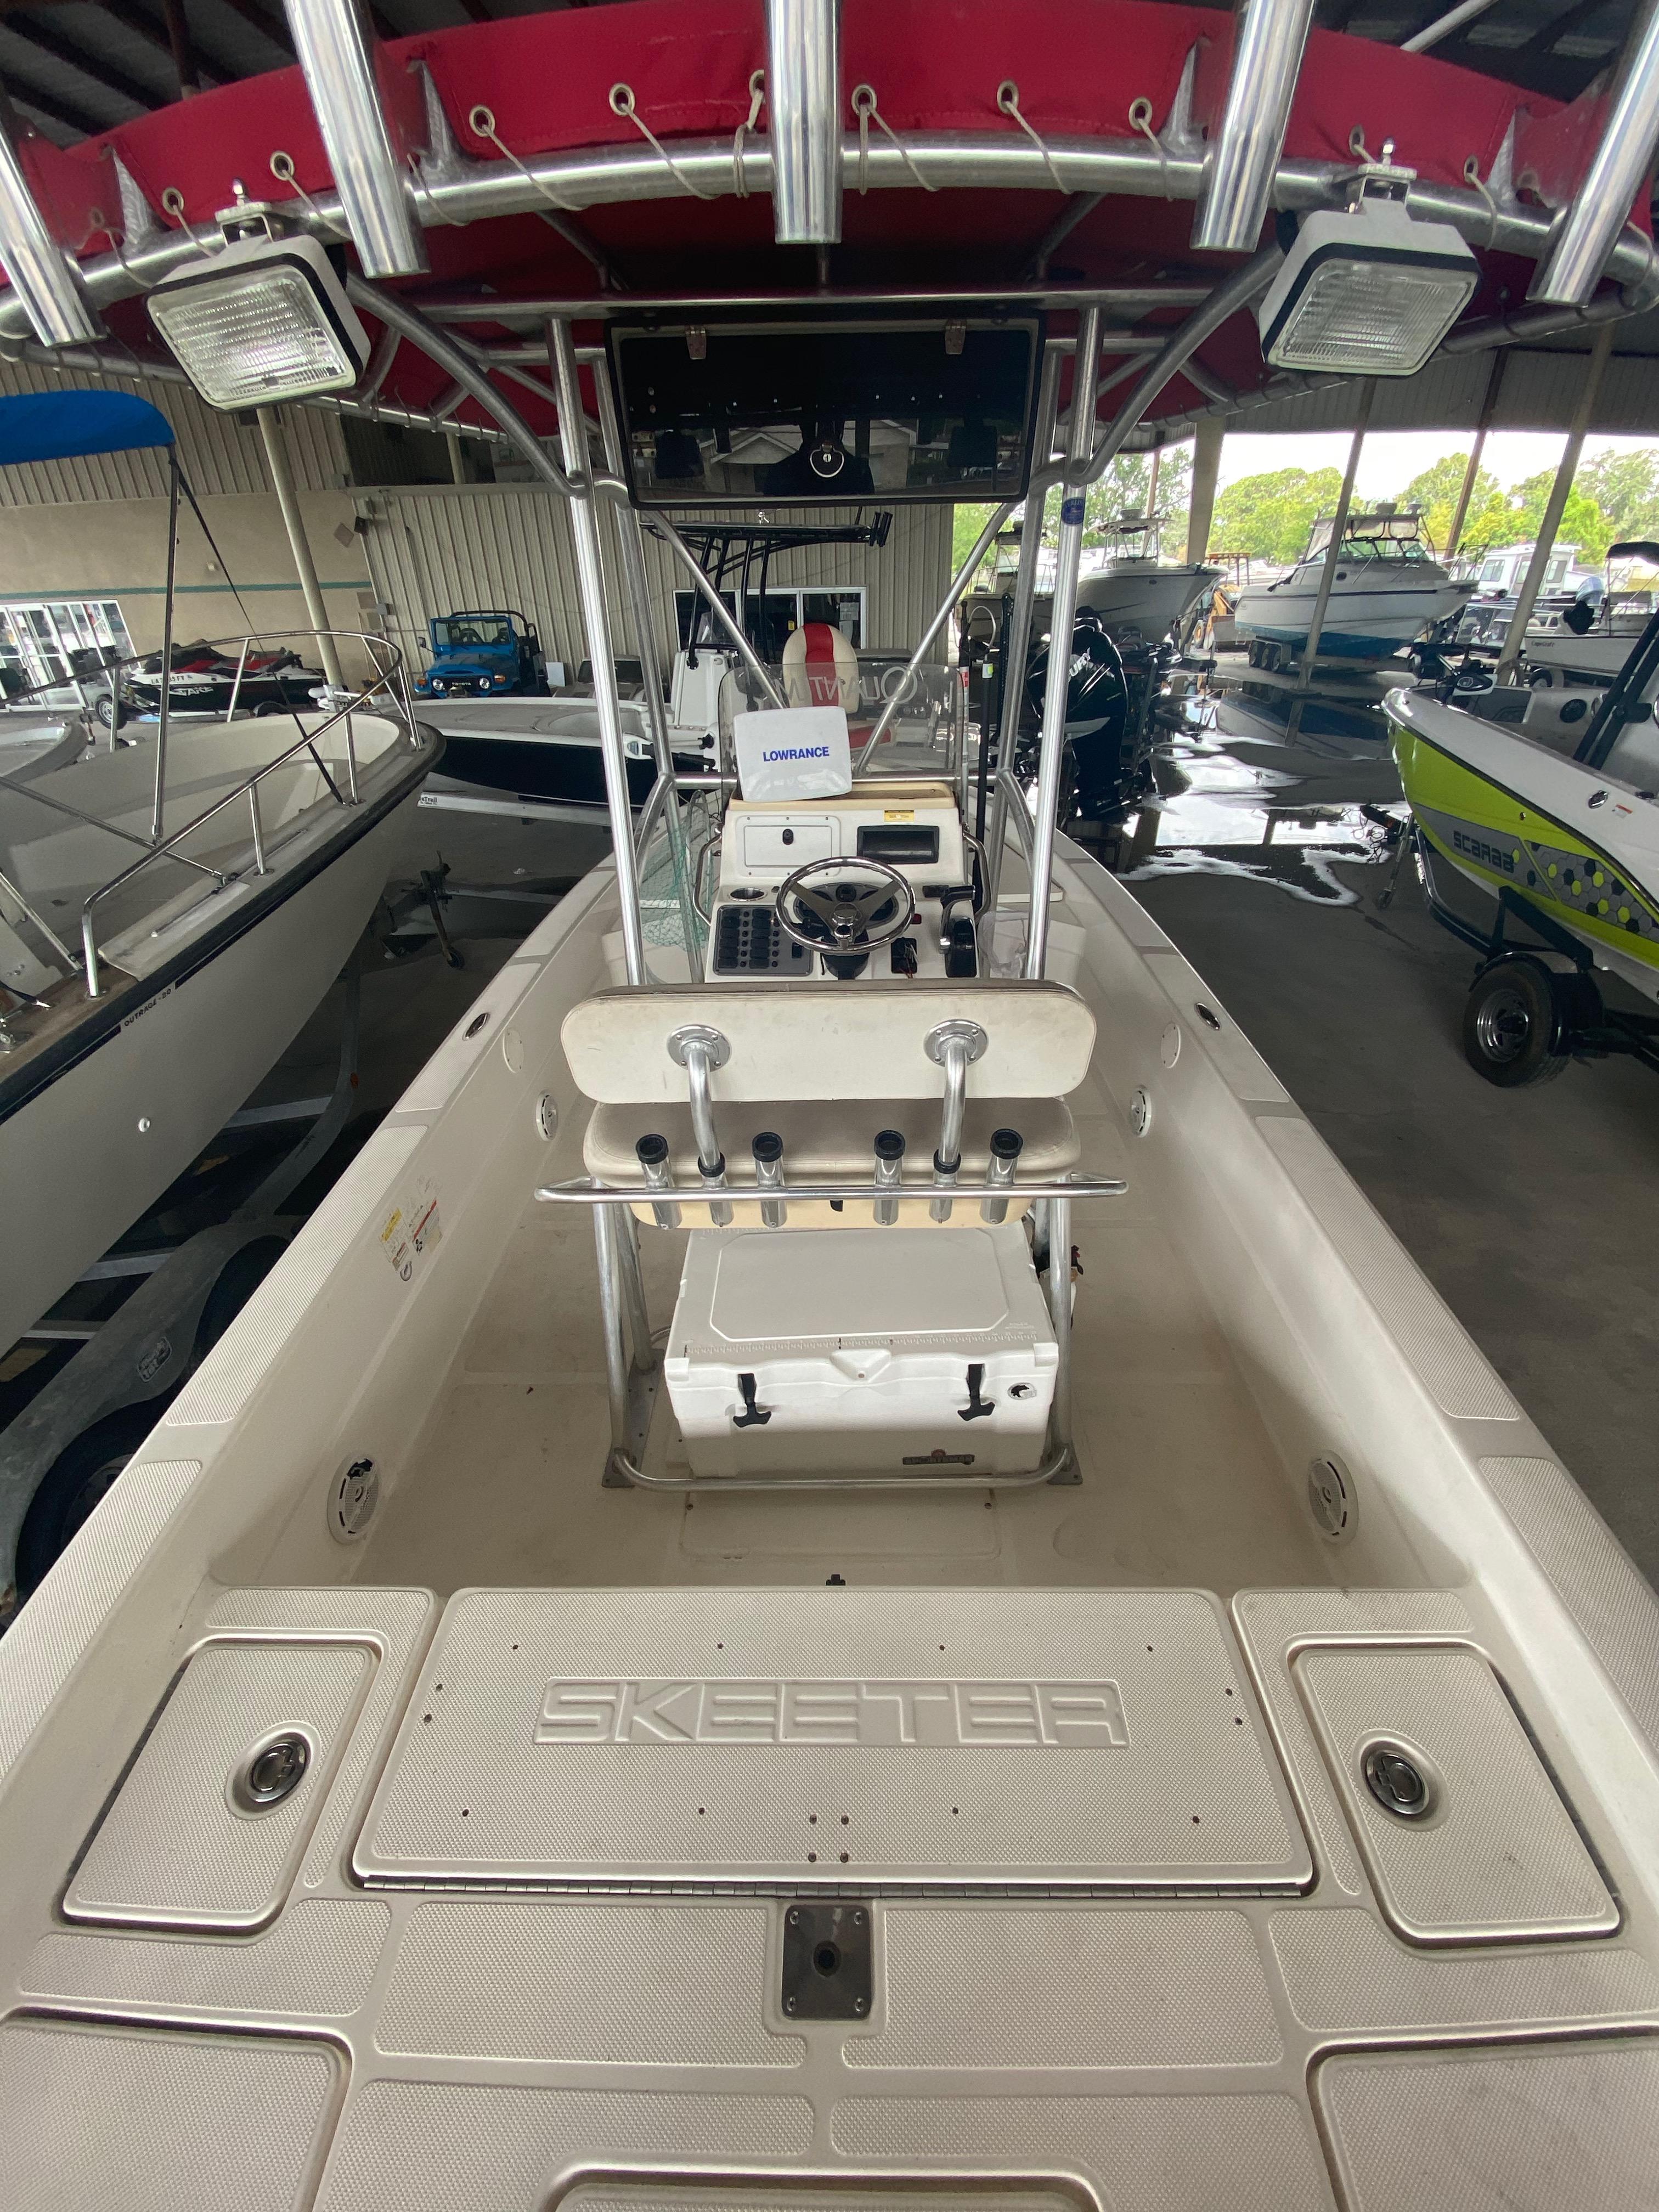 2010 Skeeter boat for sale, model of the boat is ZX24V & Image # 5 of 16